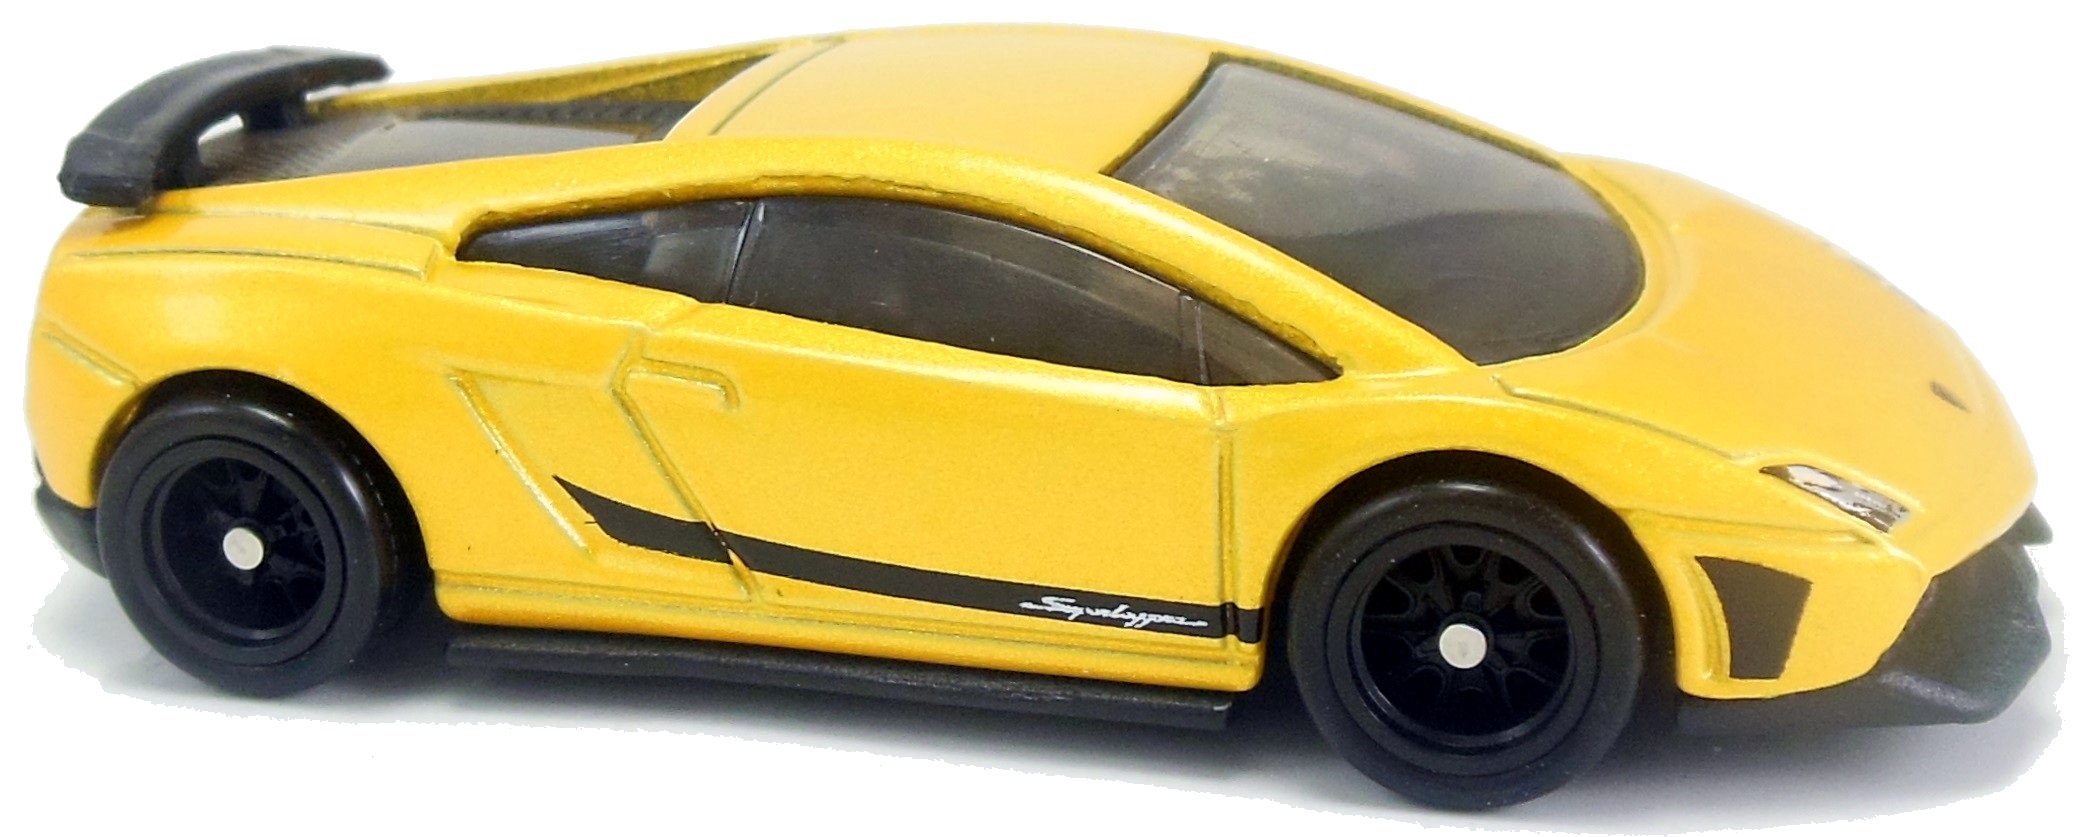 Lamborghini Gallardo Lp 570 4 Superleggera 66mm 2011 Hot Wheels Newsletter